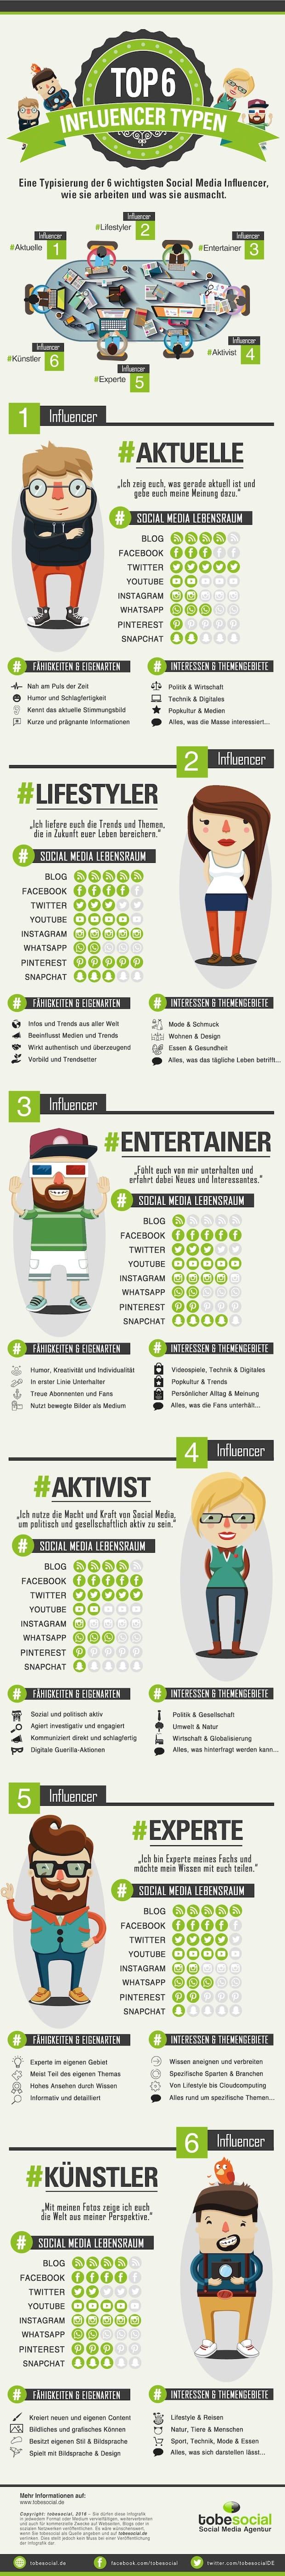 Photo of Social Media Influencer Infografik – Die Top 6 Social Media Influencer Typen für Meinungsführer Marketing